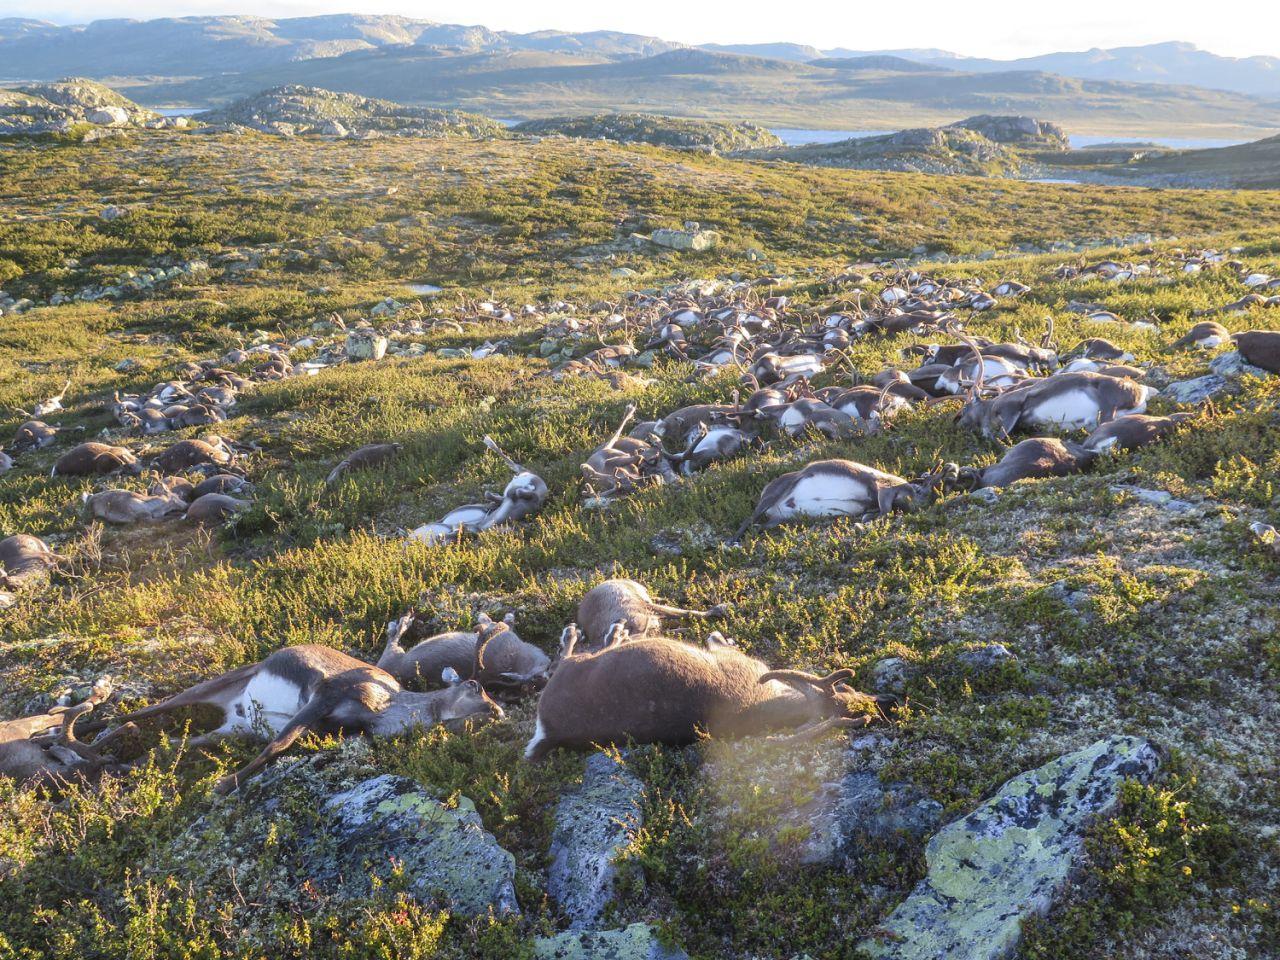 Credit: Norwegian Environment Agency